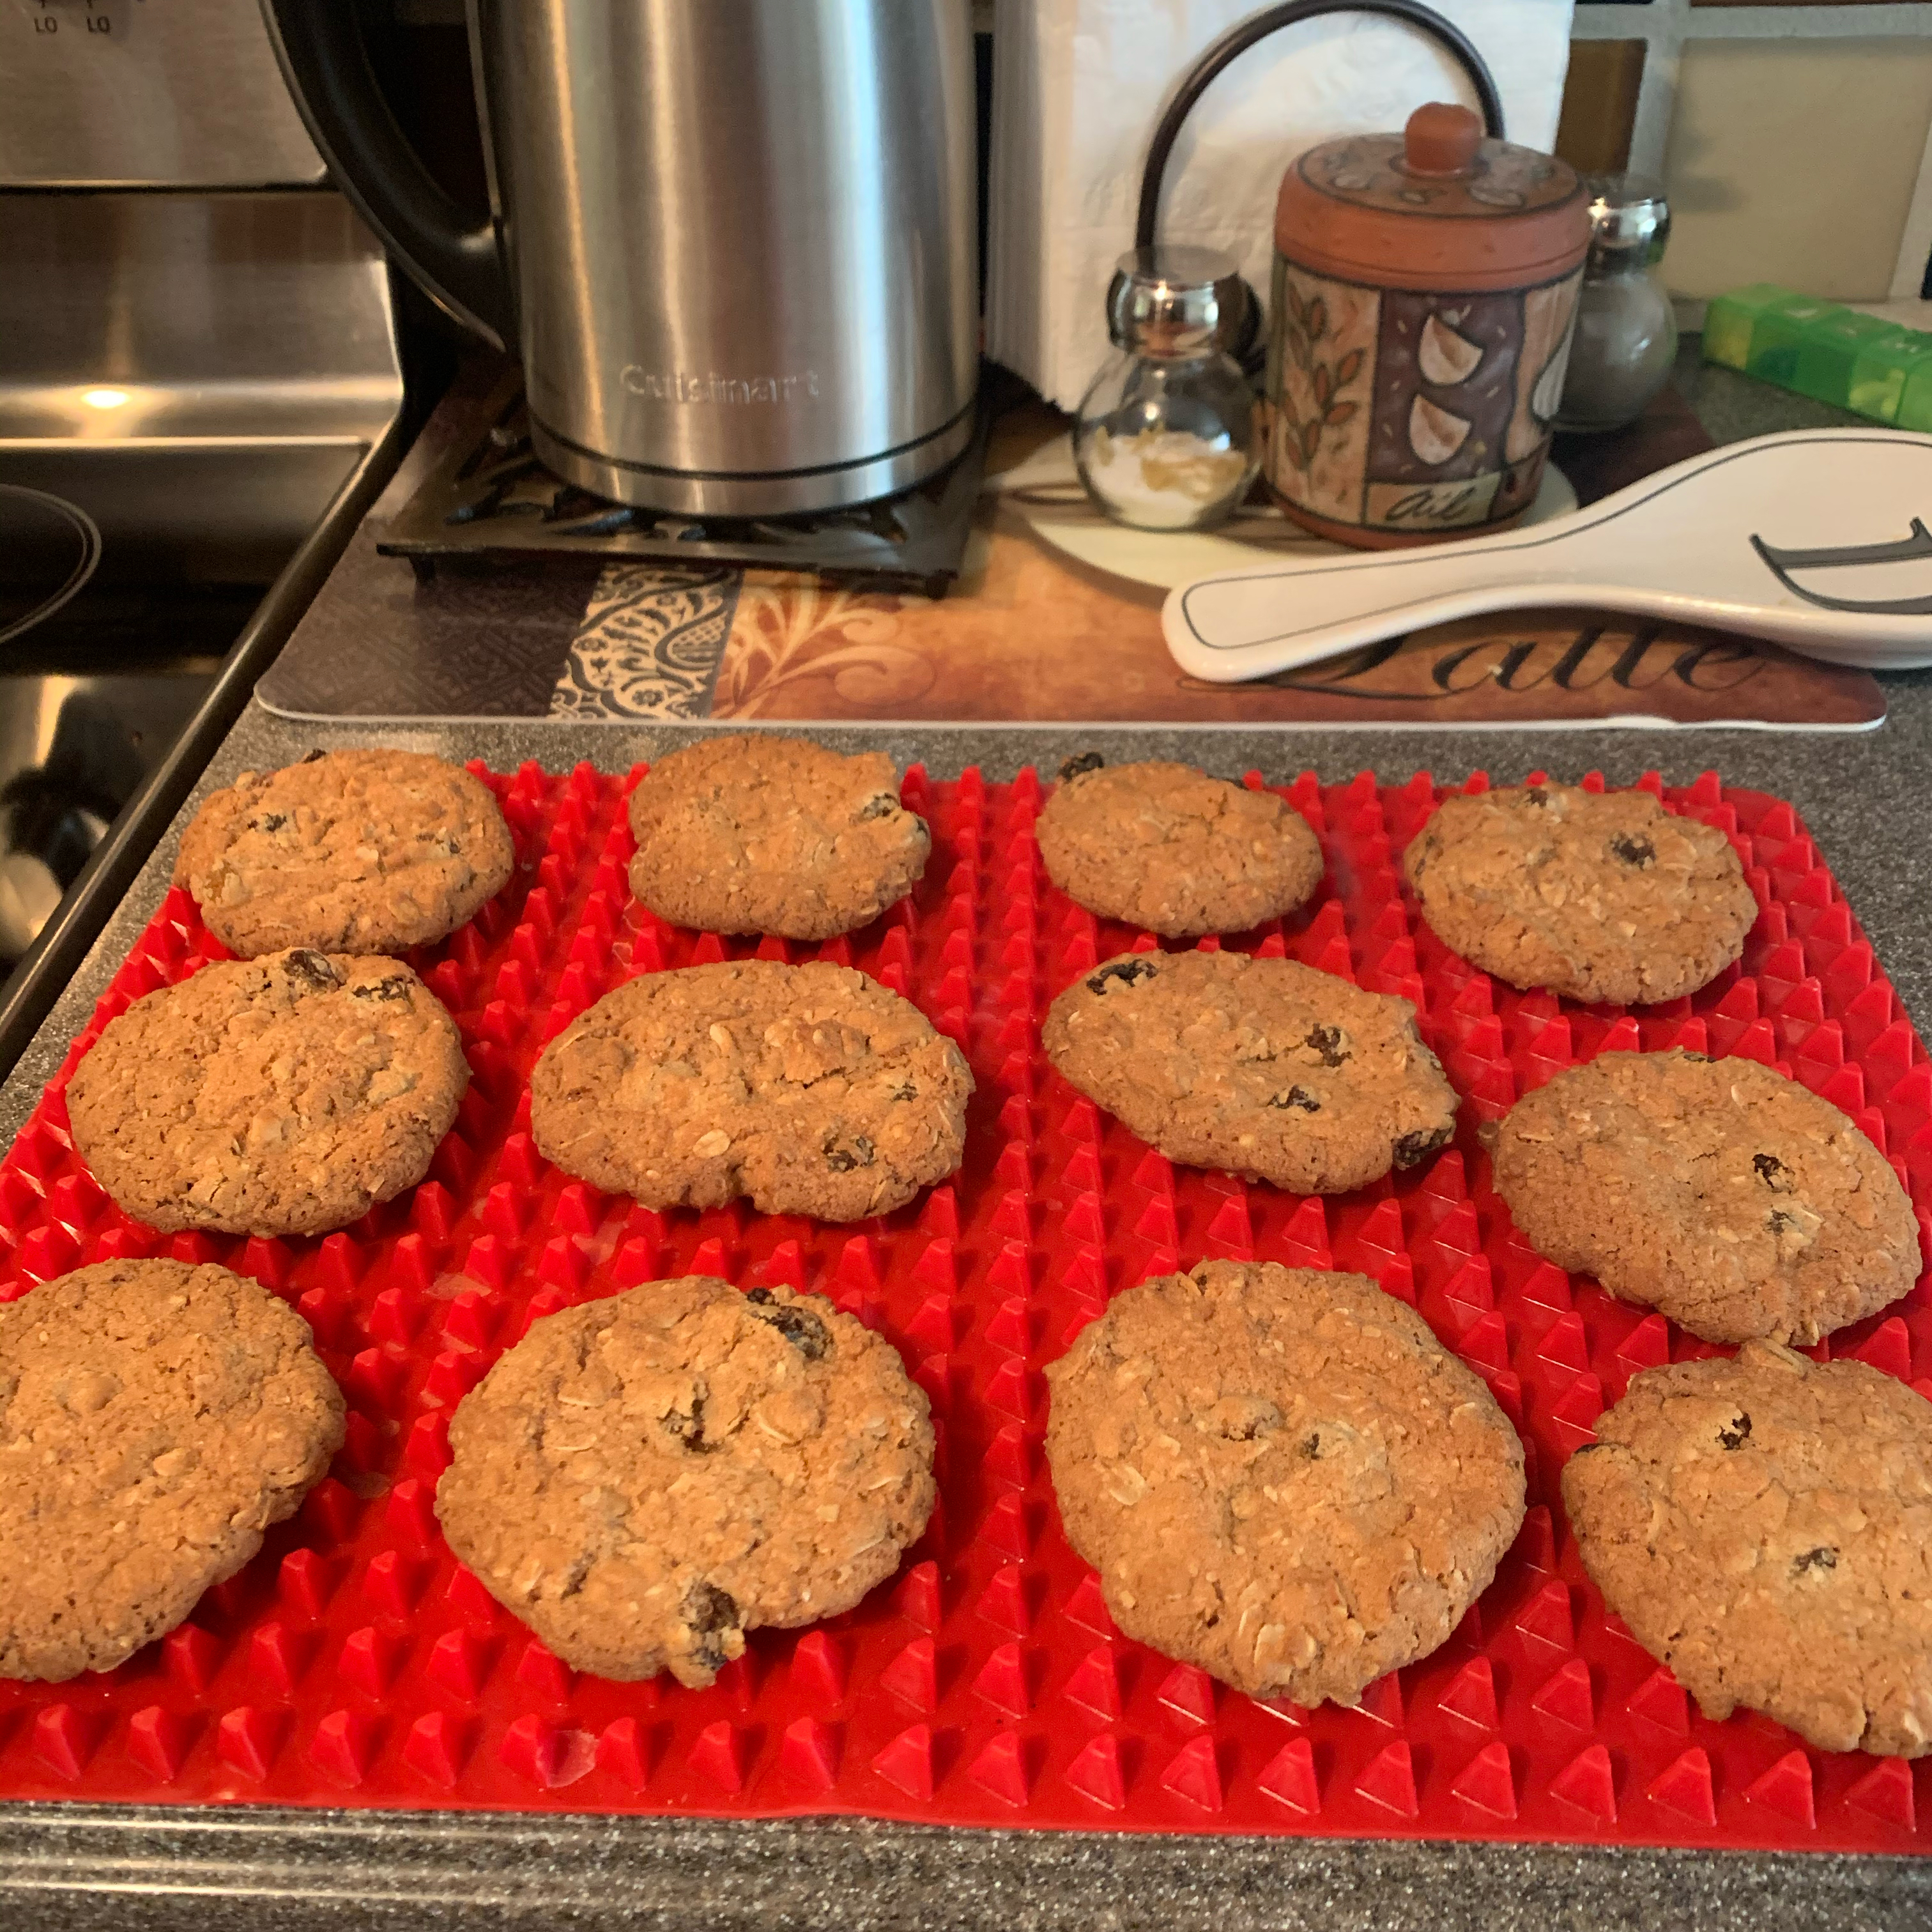 Crisp Oatmeal Cookies Denise J Washington